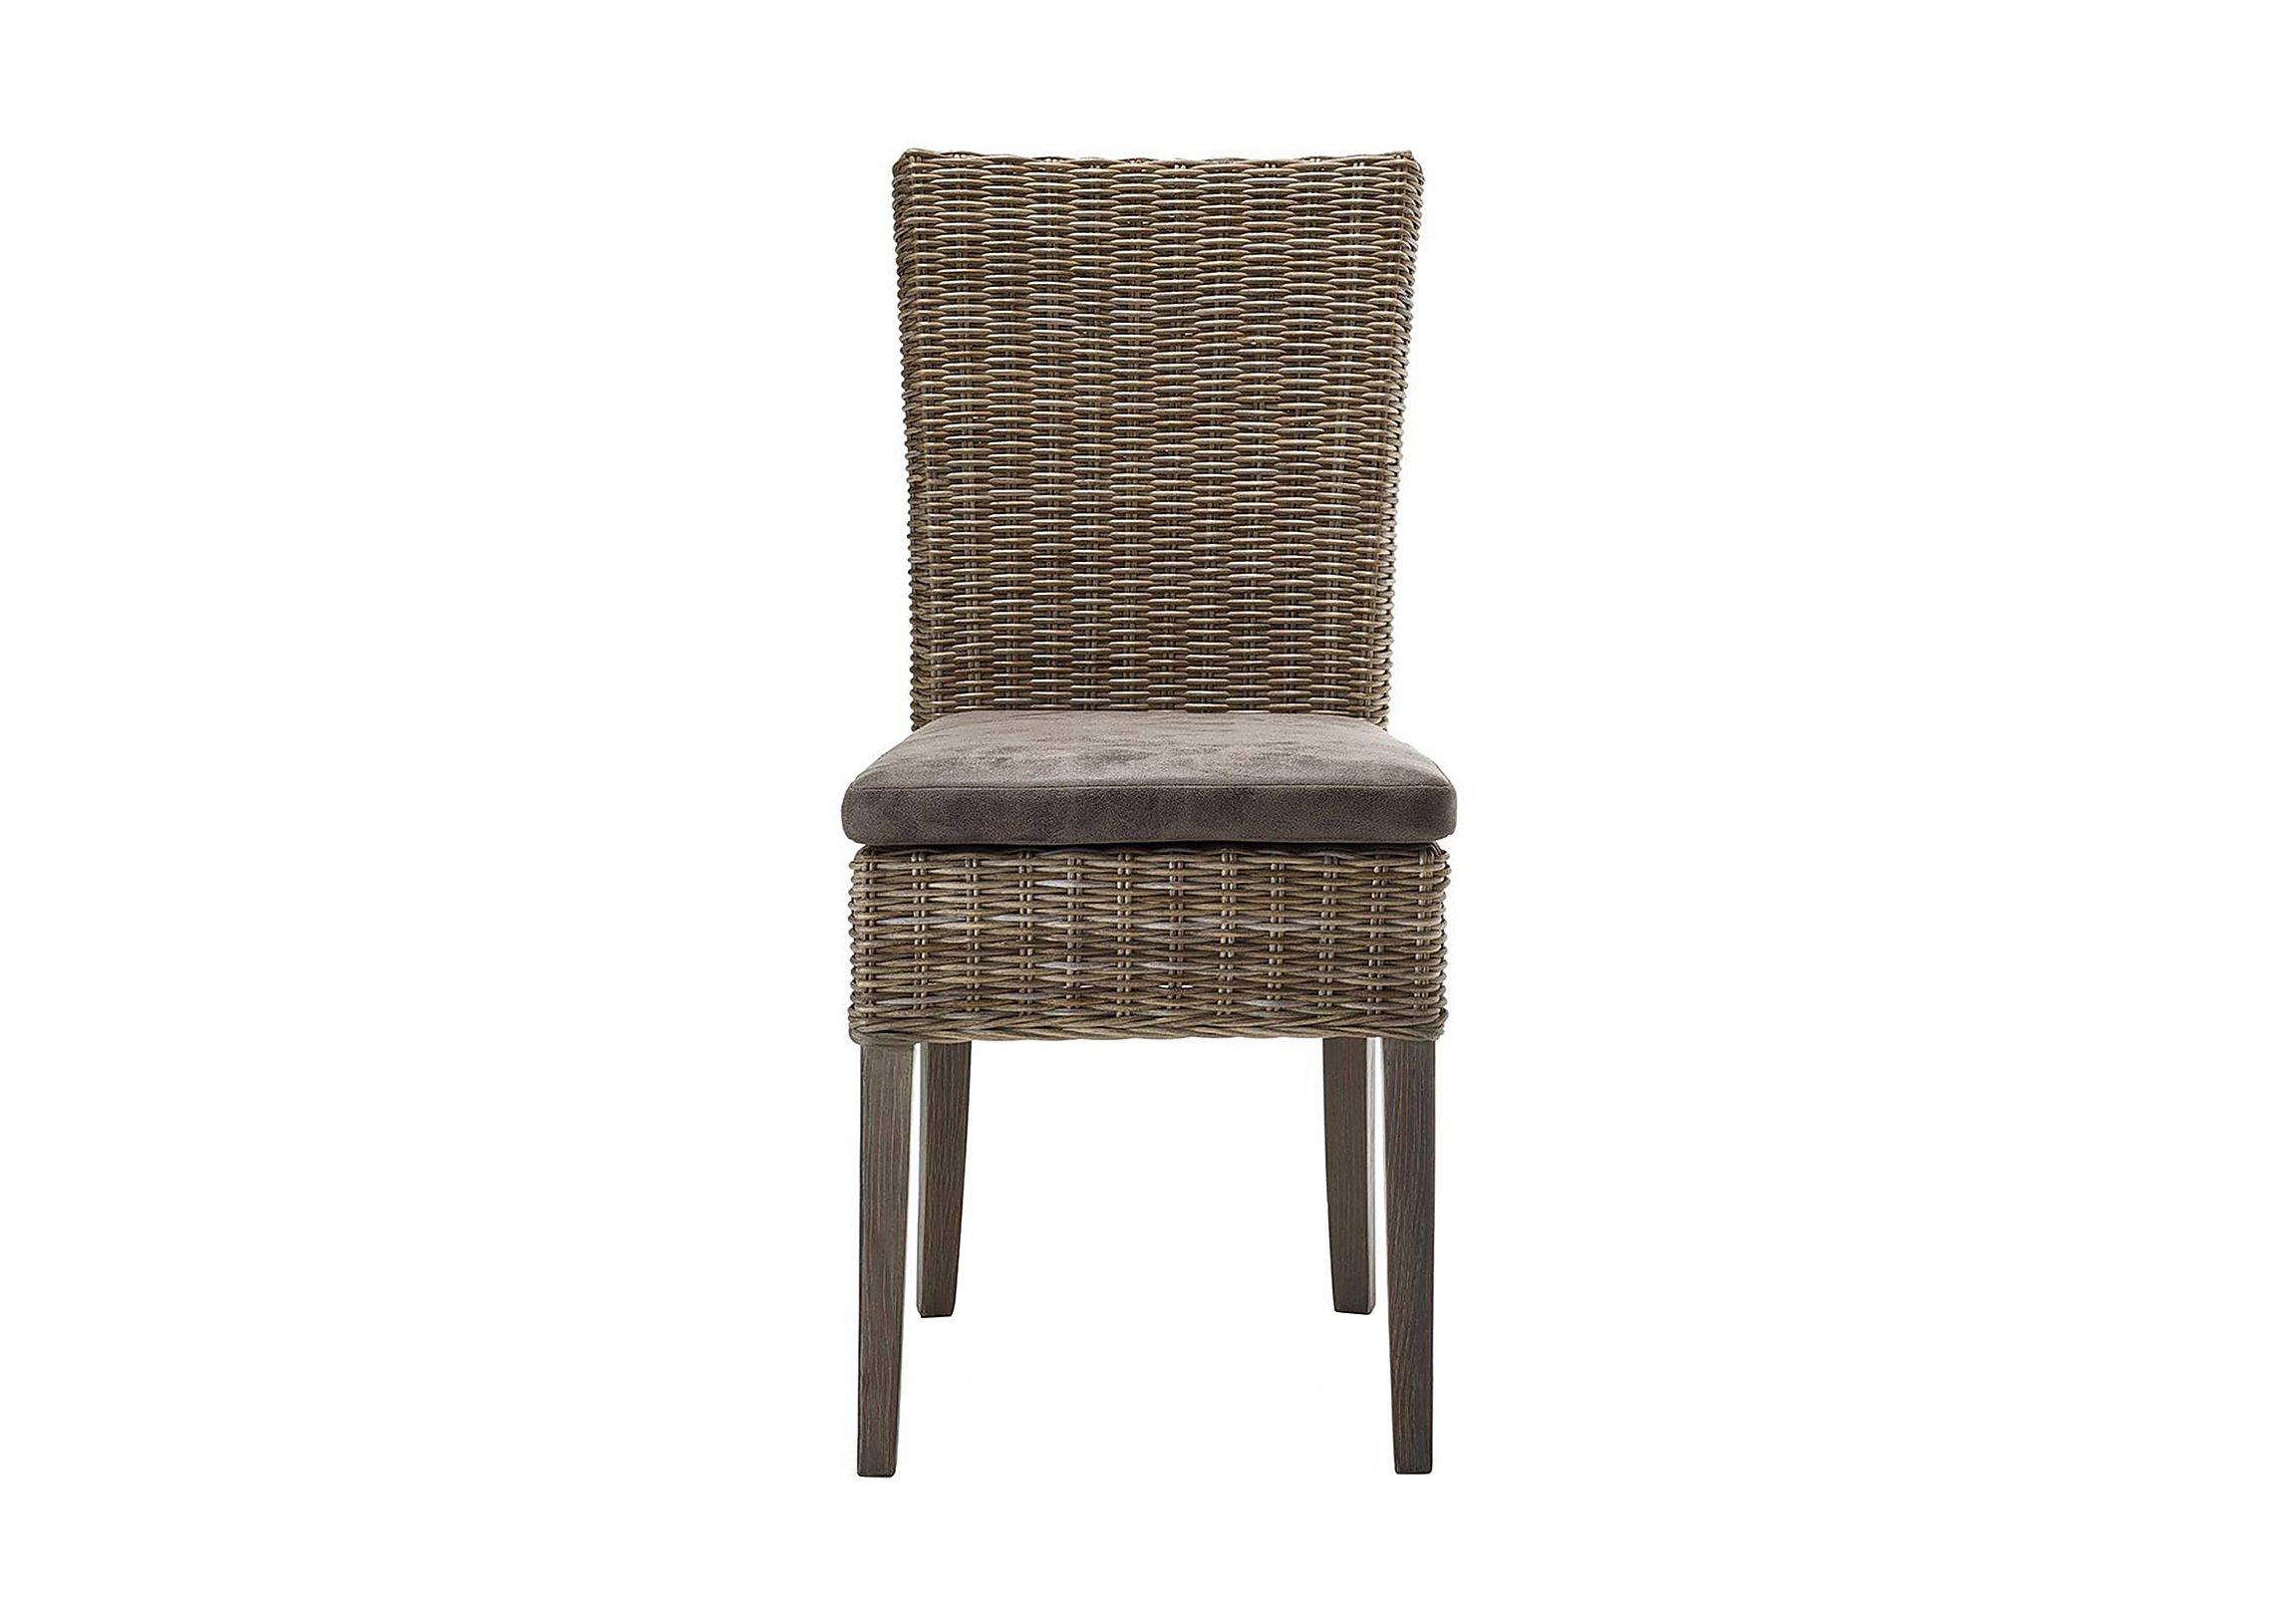 Habufa oslo rattan dining chair